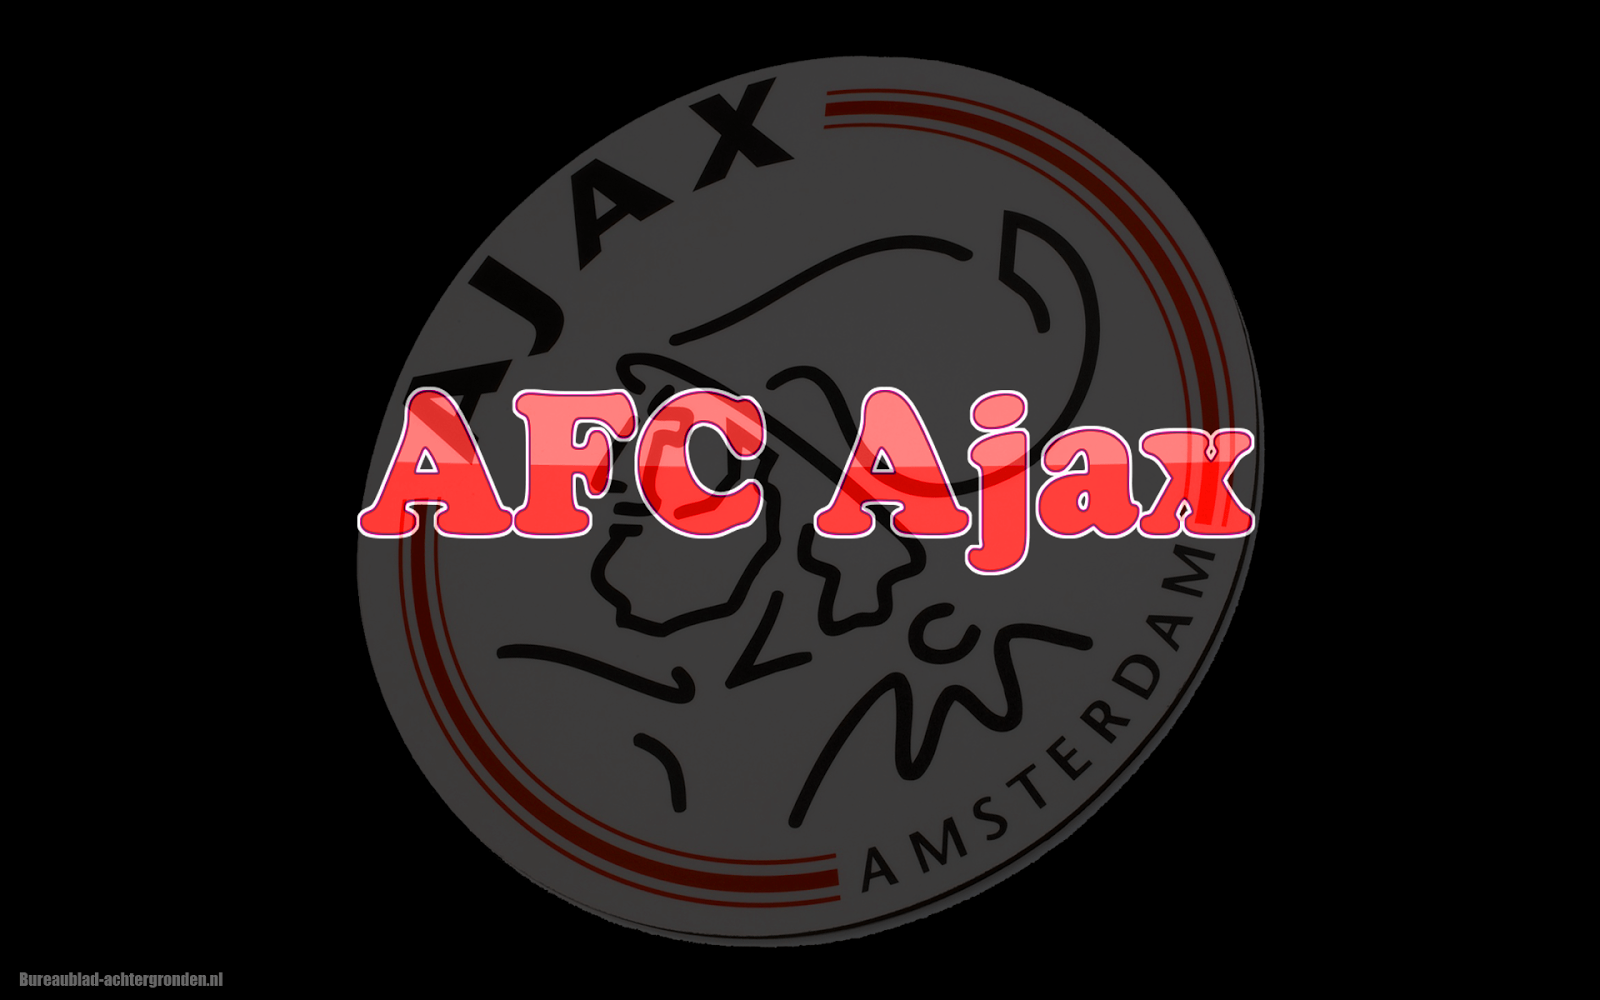 Mooie Ajax achtergrond met rode letters